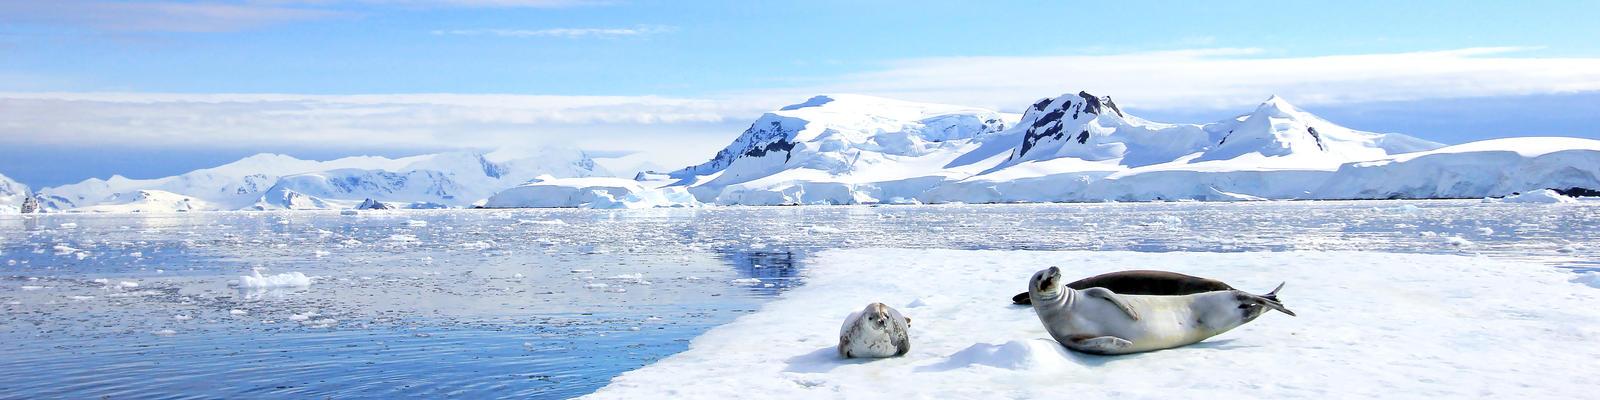 Crabeater Seals on Ice Floe, Antarctic Peninsula, Antarctica (Photo: reisegraf.ch/Shutterstock)